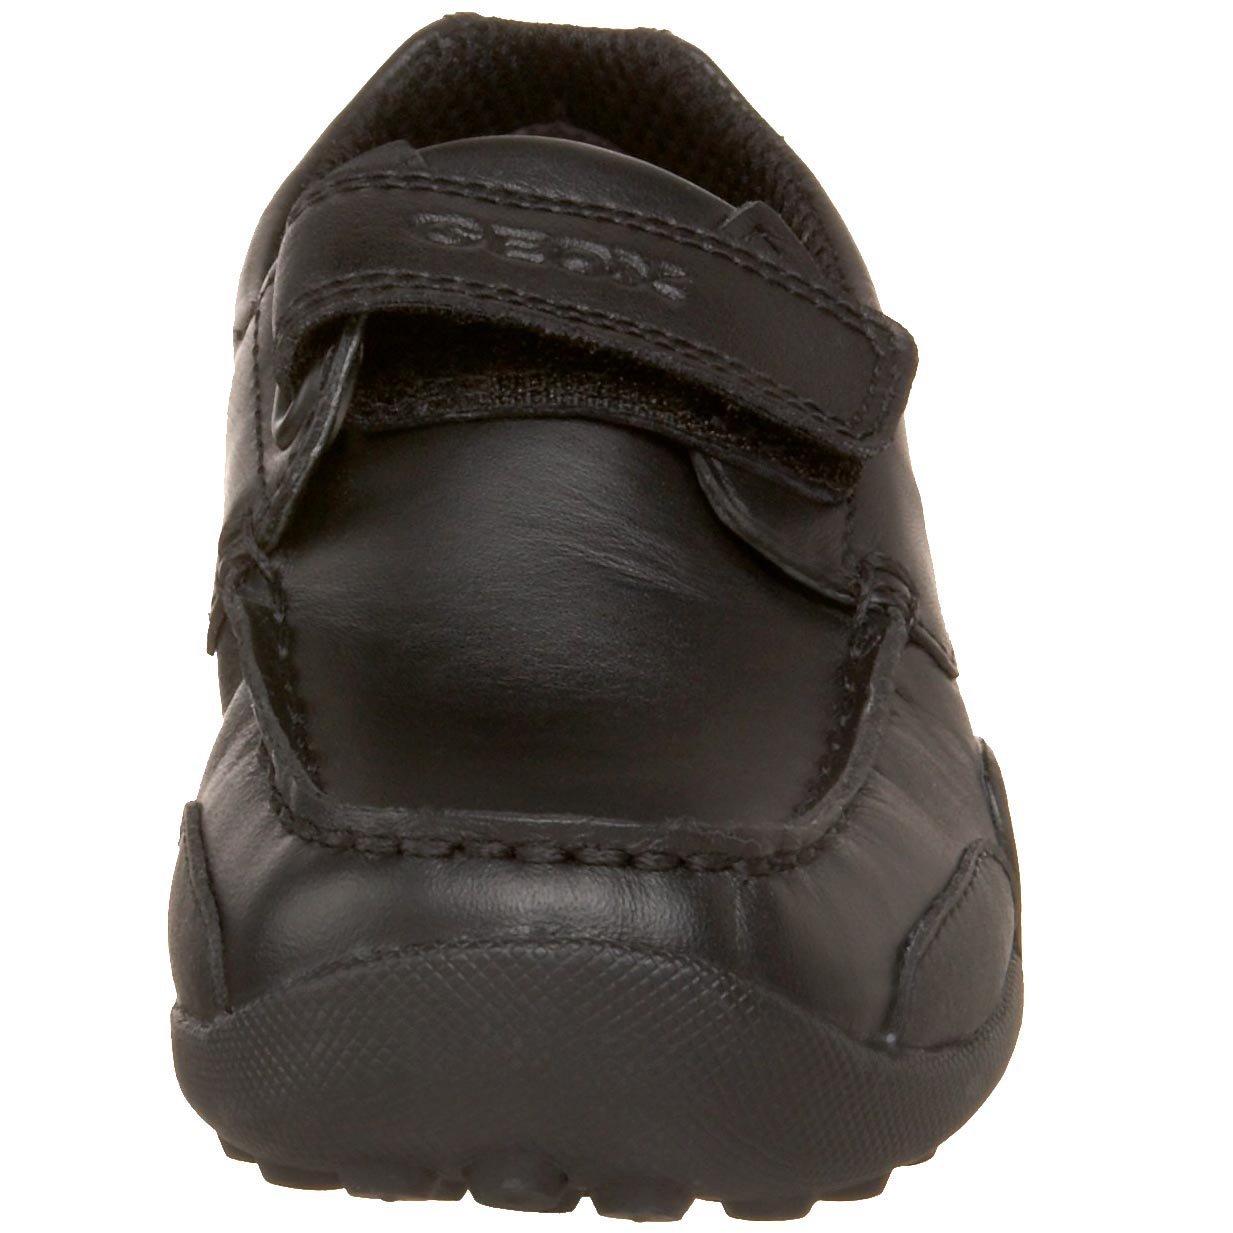 Geox Boy's JR W.SNAKE MOCASSINO Shoe,black,37 M EU Big Kid (5 US) by Geox (Image #4)